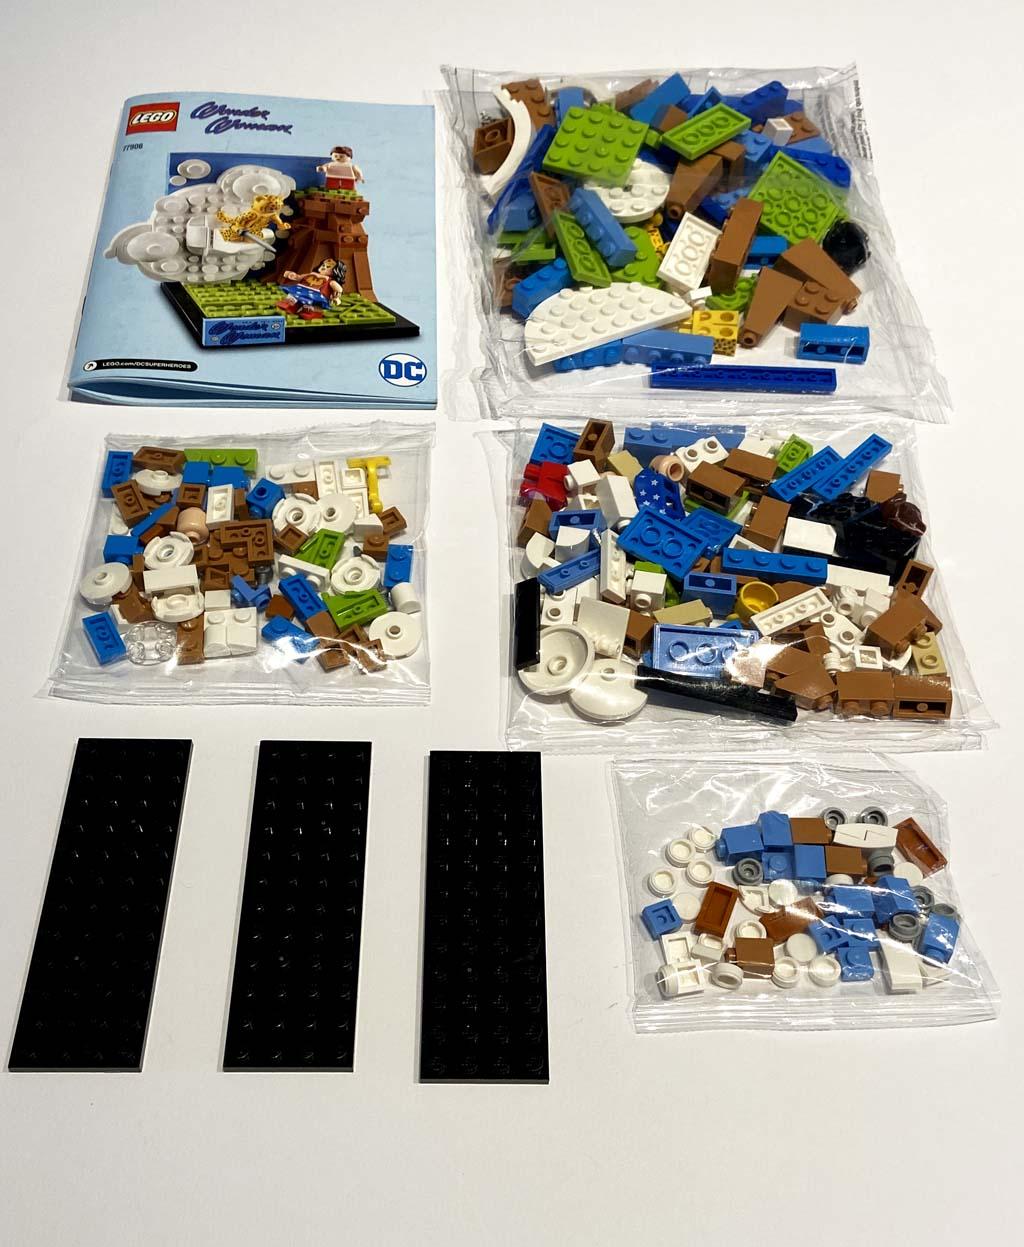 LEGO DC 77906 Wonder Woman Unboxing